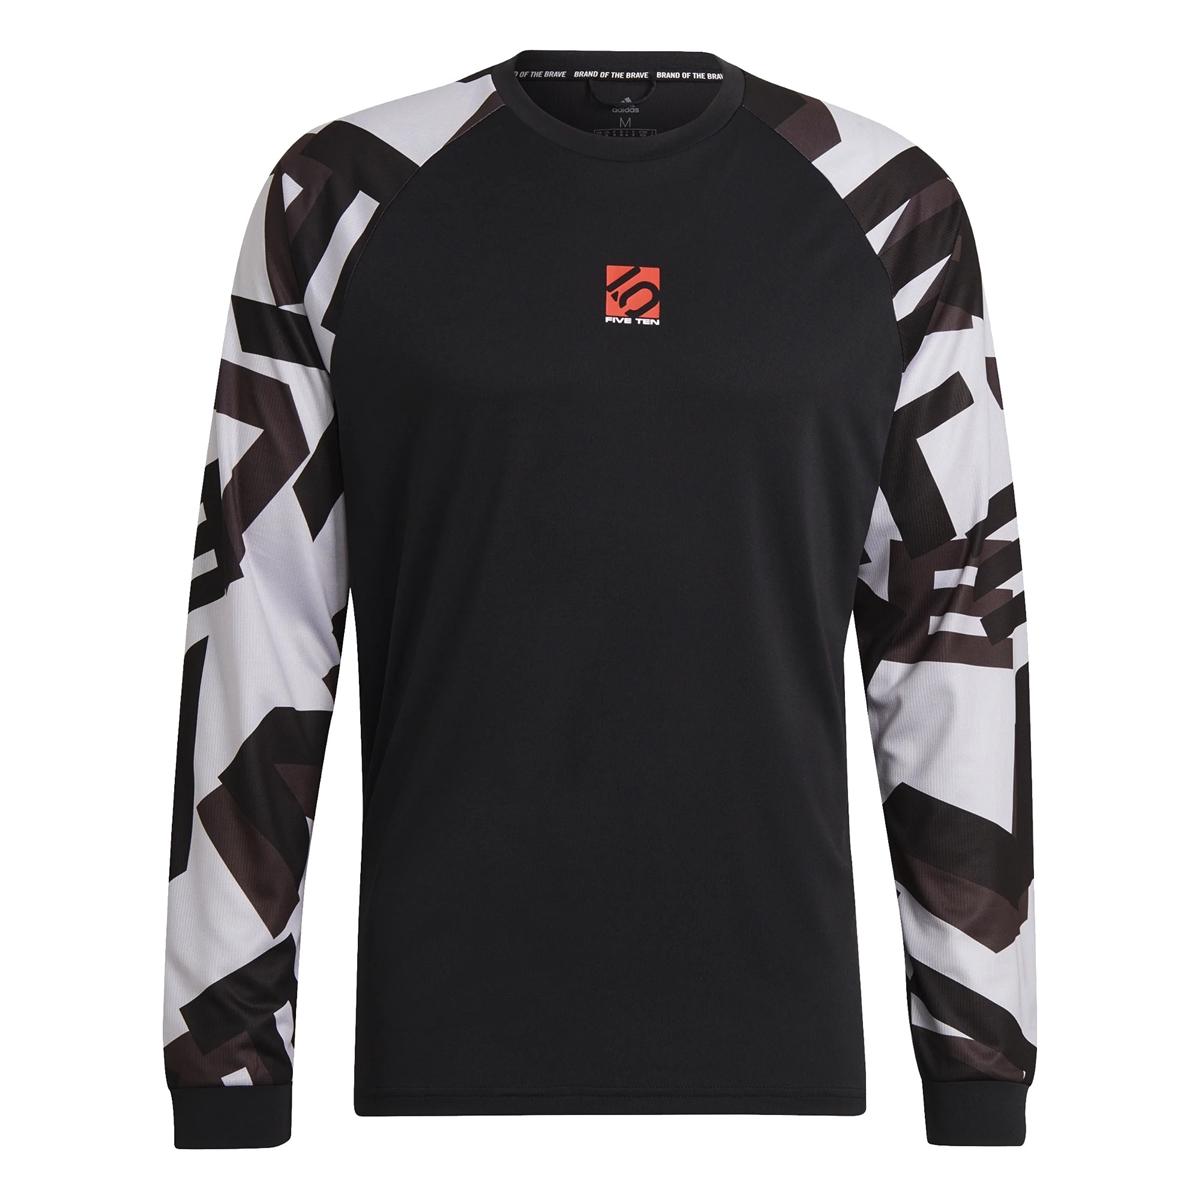 Long-Sleeve Jersey 5.10 TrailX Black/White 2021 Size S